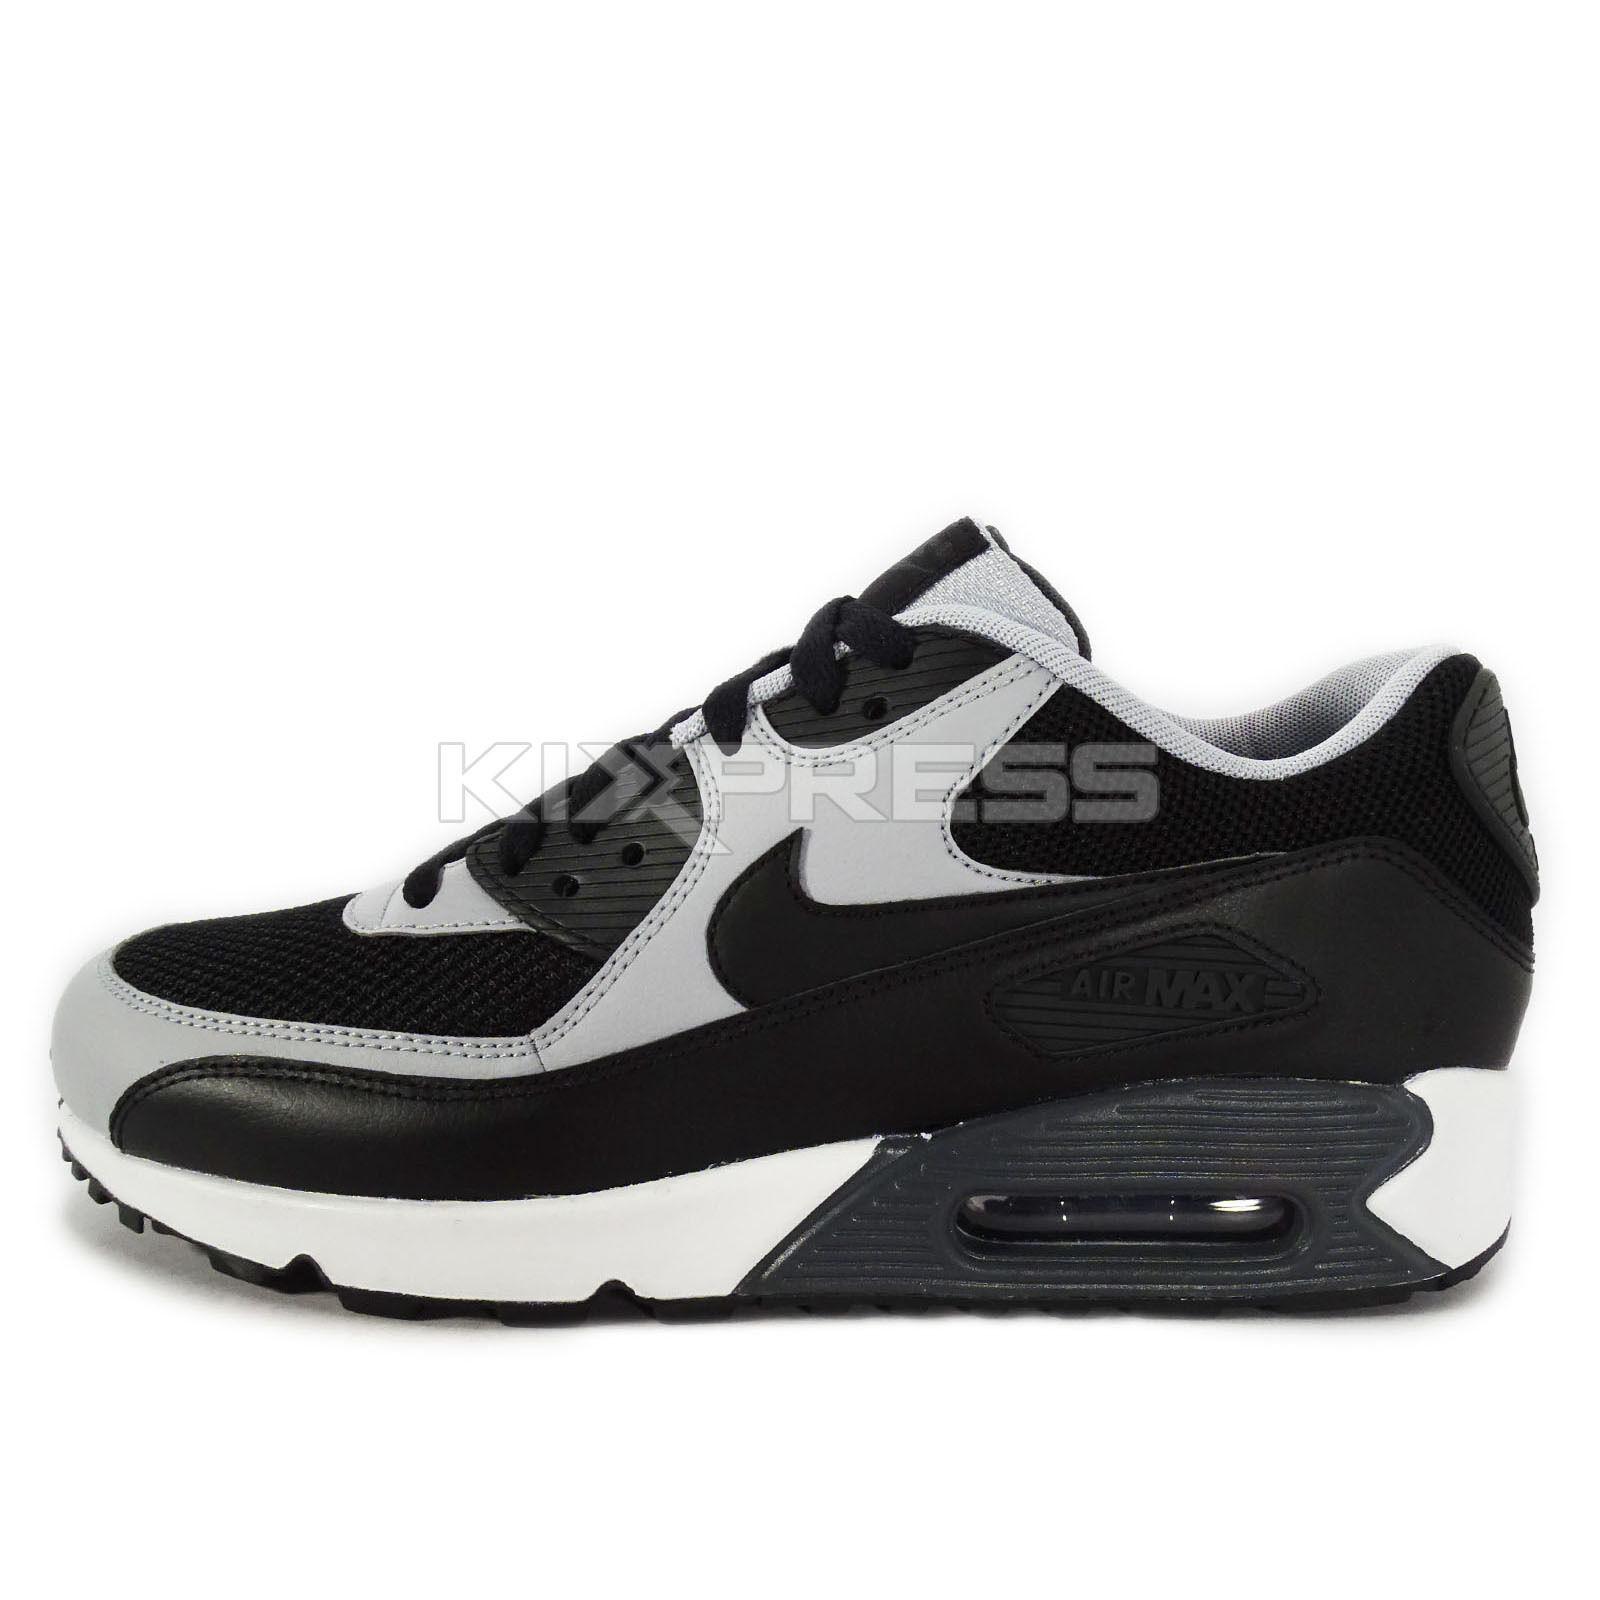 Nike Air Max 90 Essential Men's Running Khaki Authentic Select US Sz